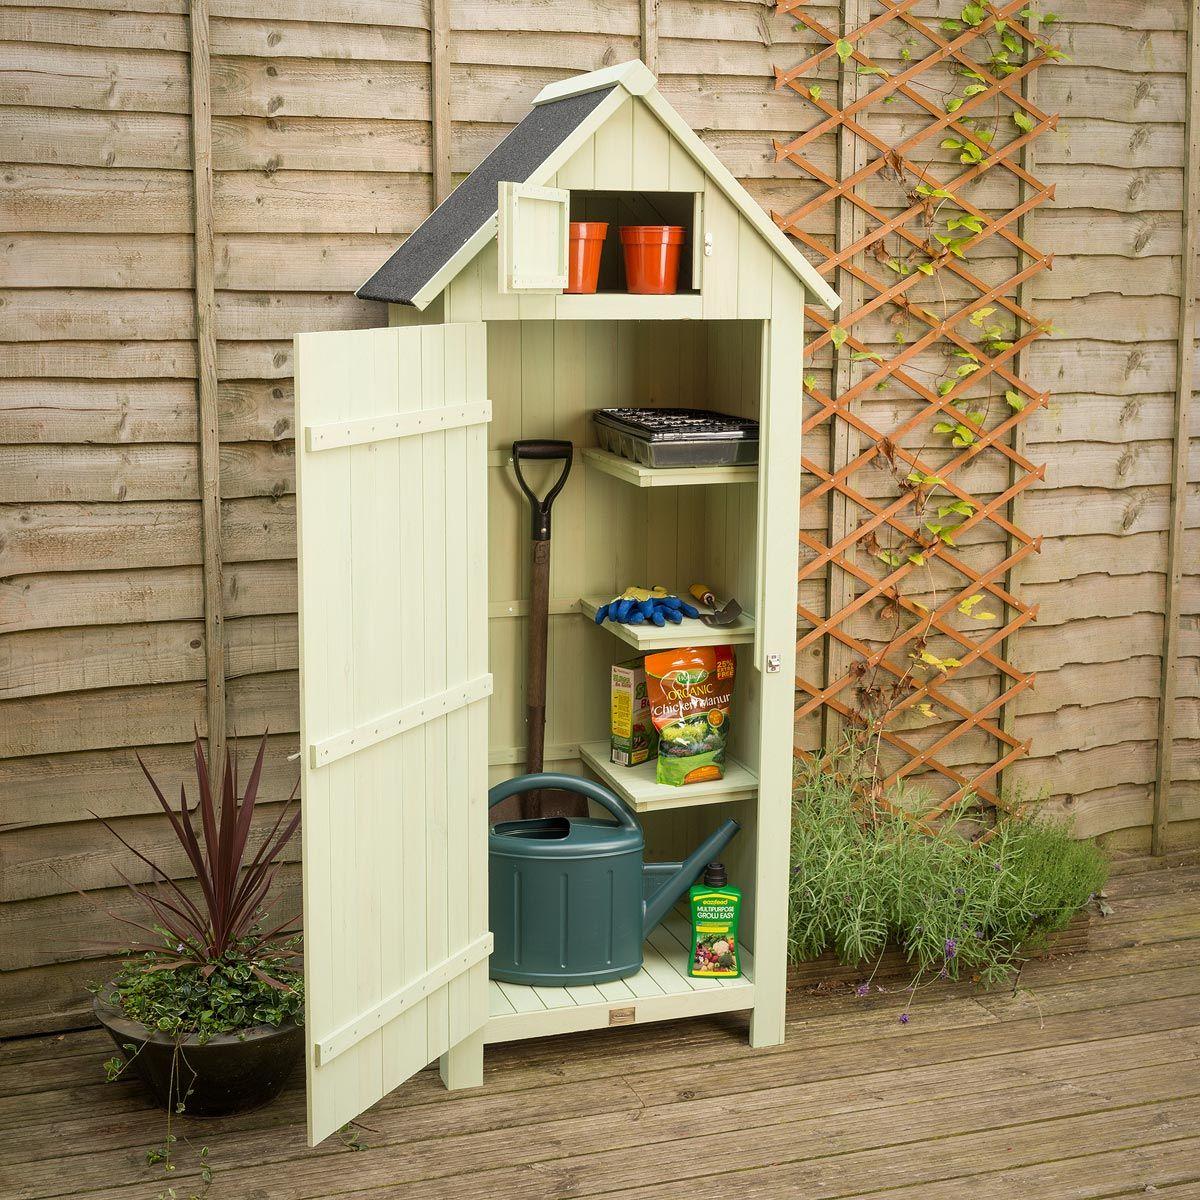 Christow Slimline Garden Shed With Lockable Door | Small garden ...